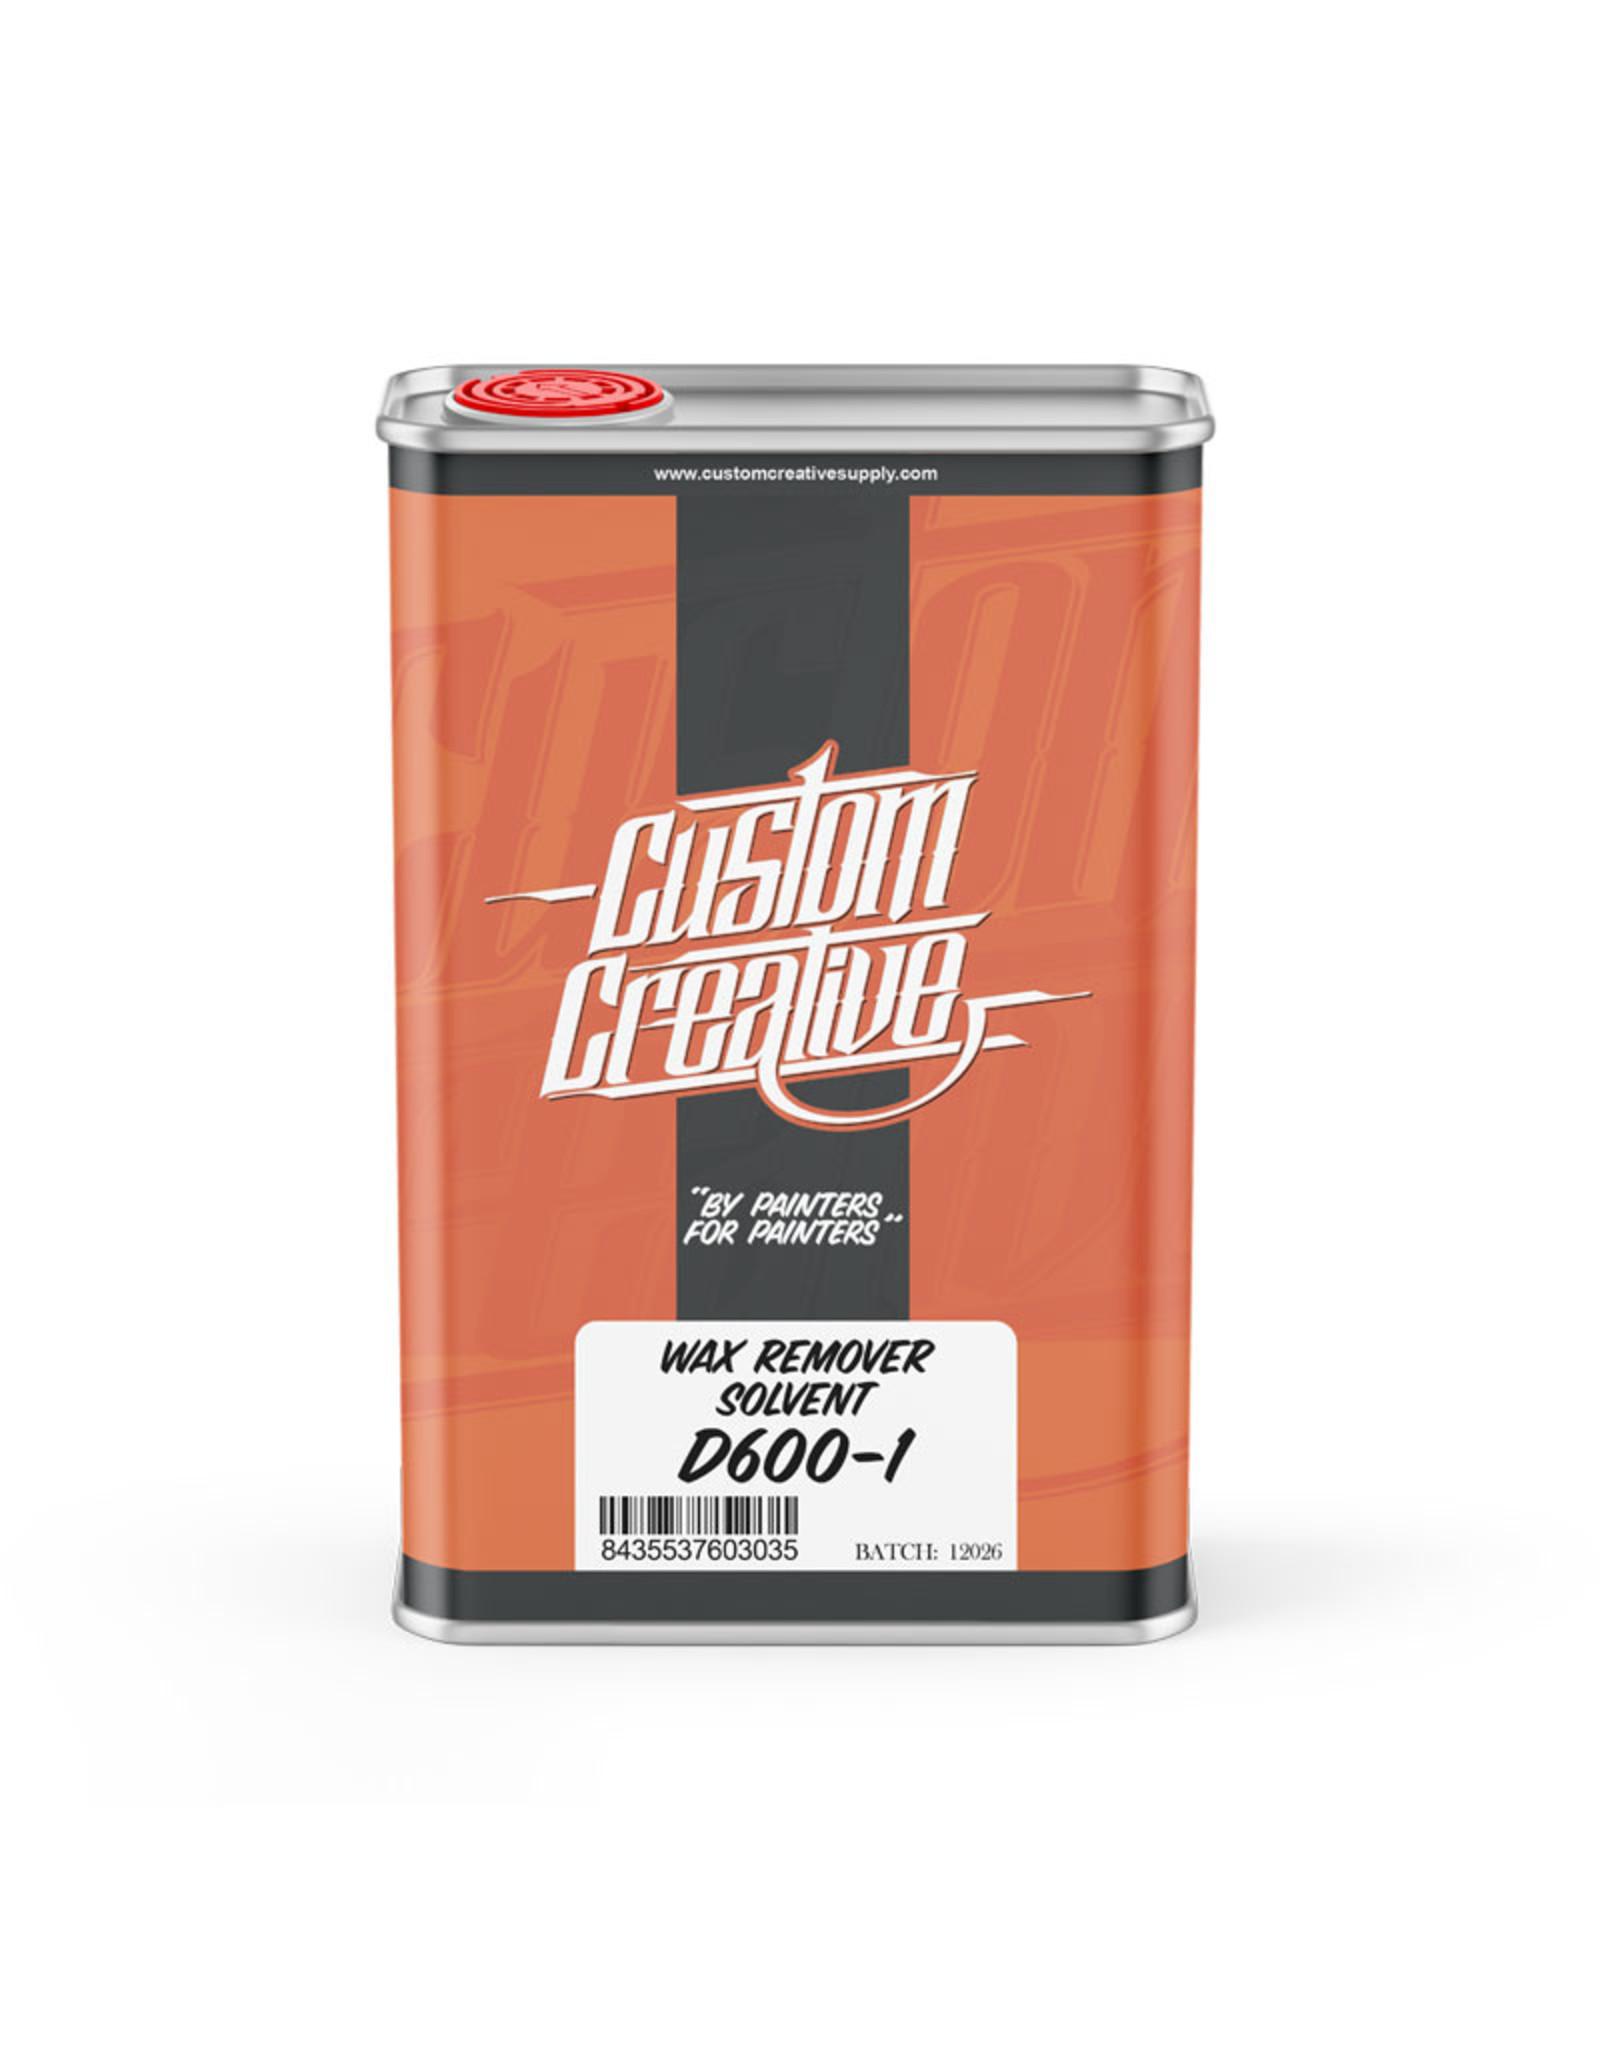 Custom Creative Custom Creative D600 (Standard) Solvent-Based Wax Remover